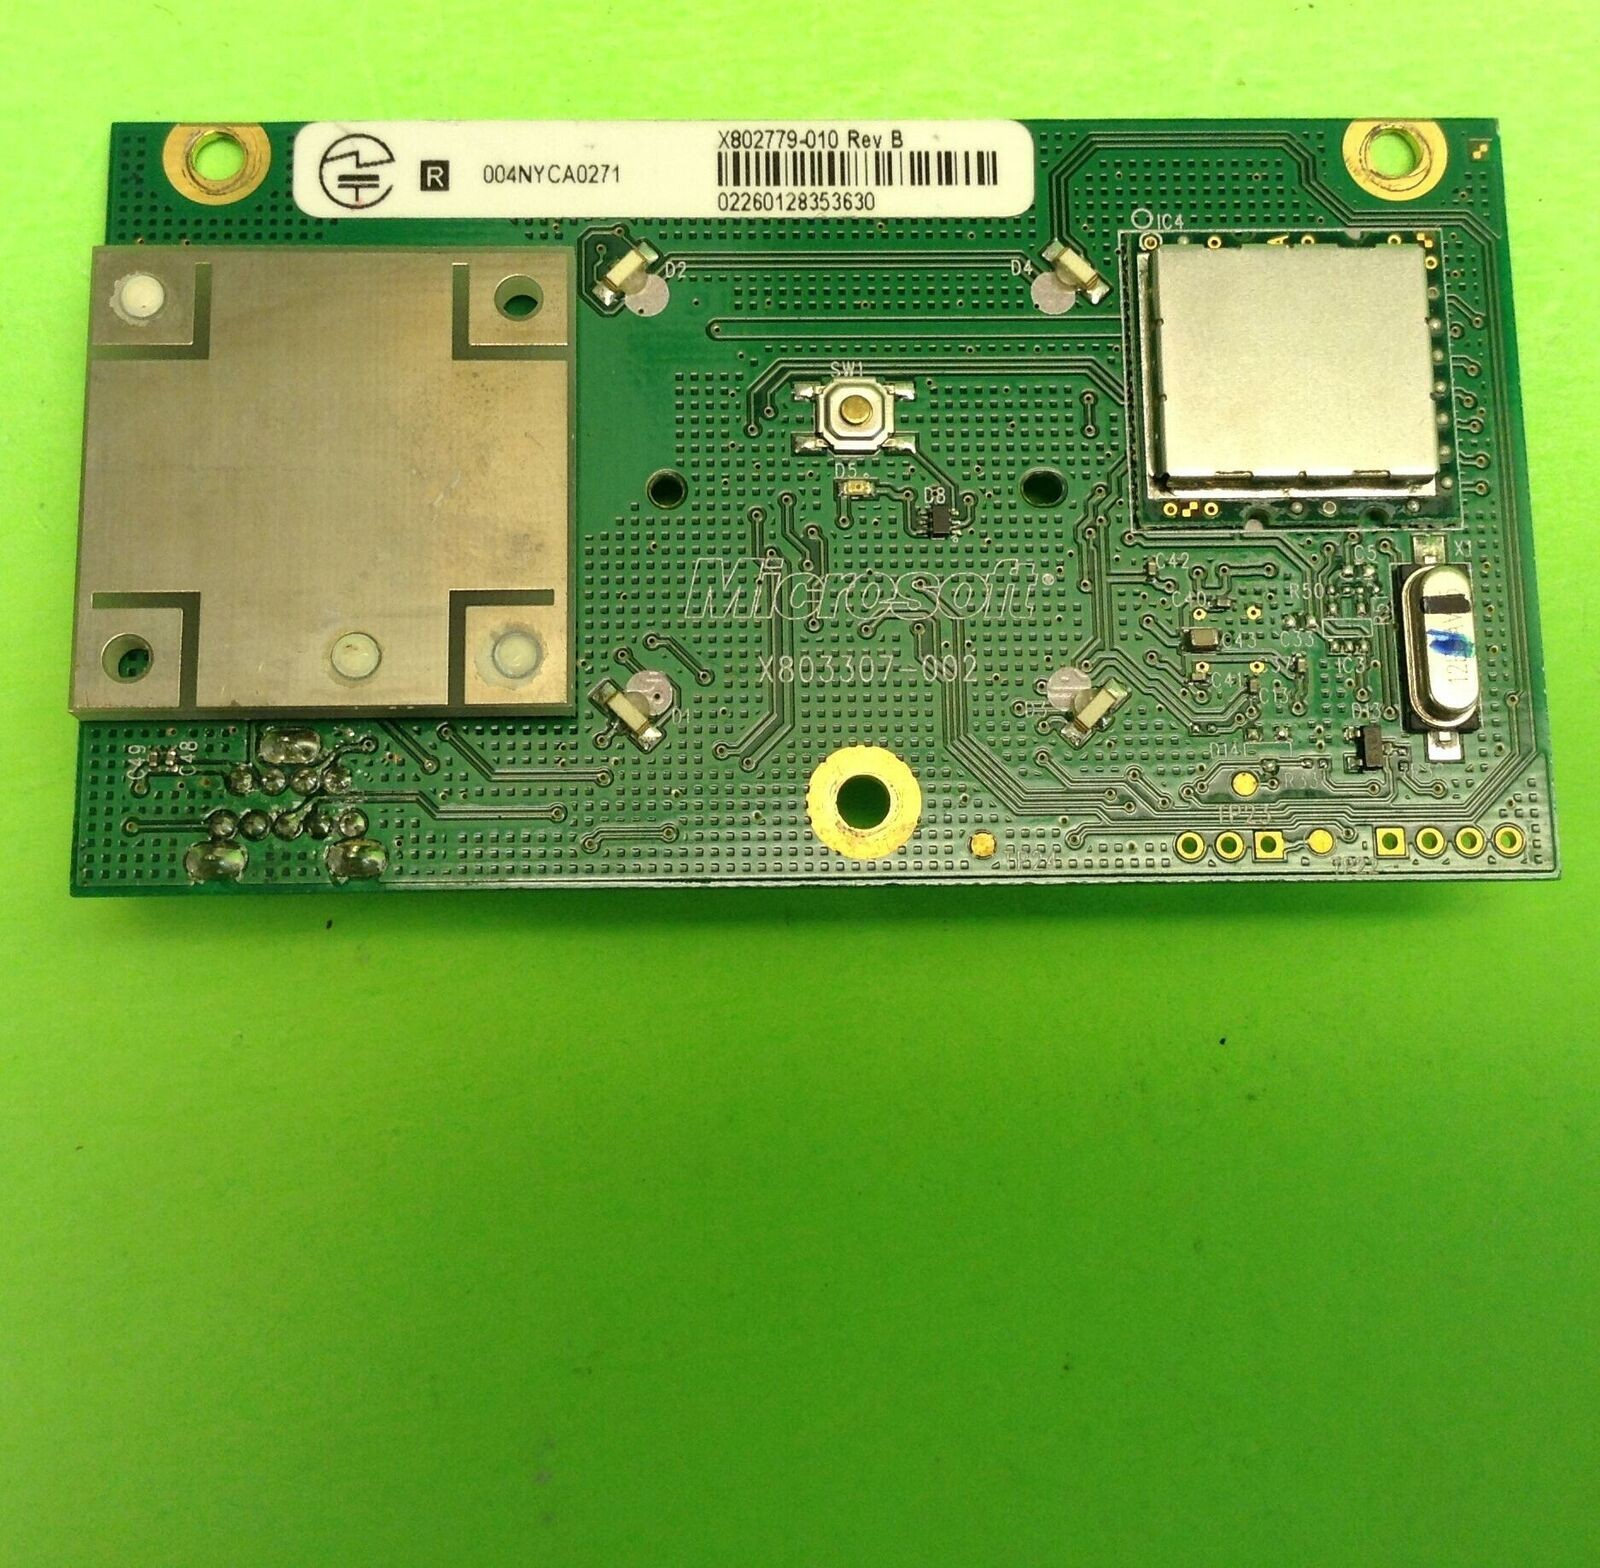 MICROSOFT XBOX 360 VIDEO GAME RF MODULE AND POWER BUTTON BOARD X 002 X 010